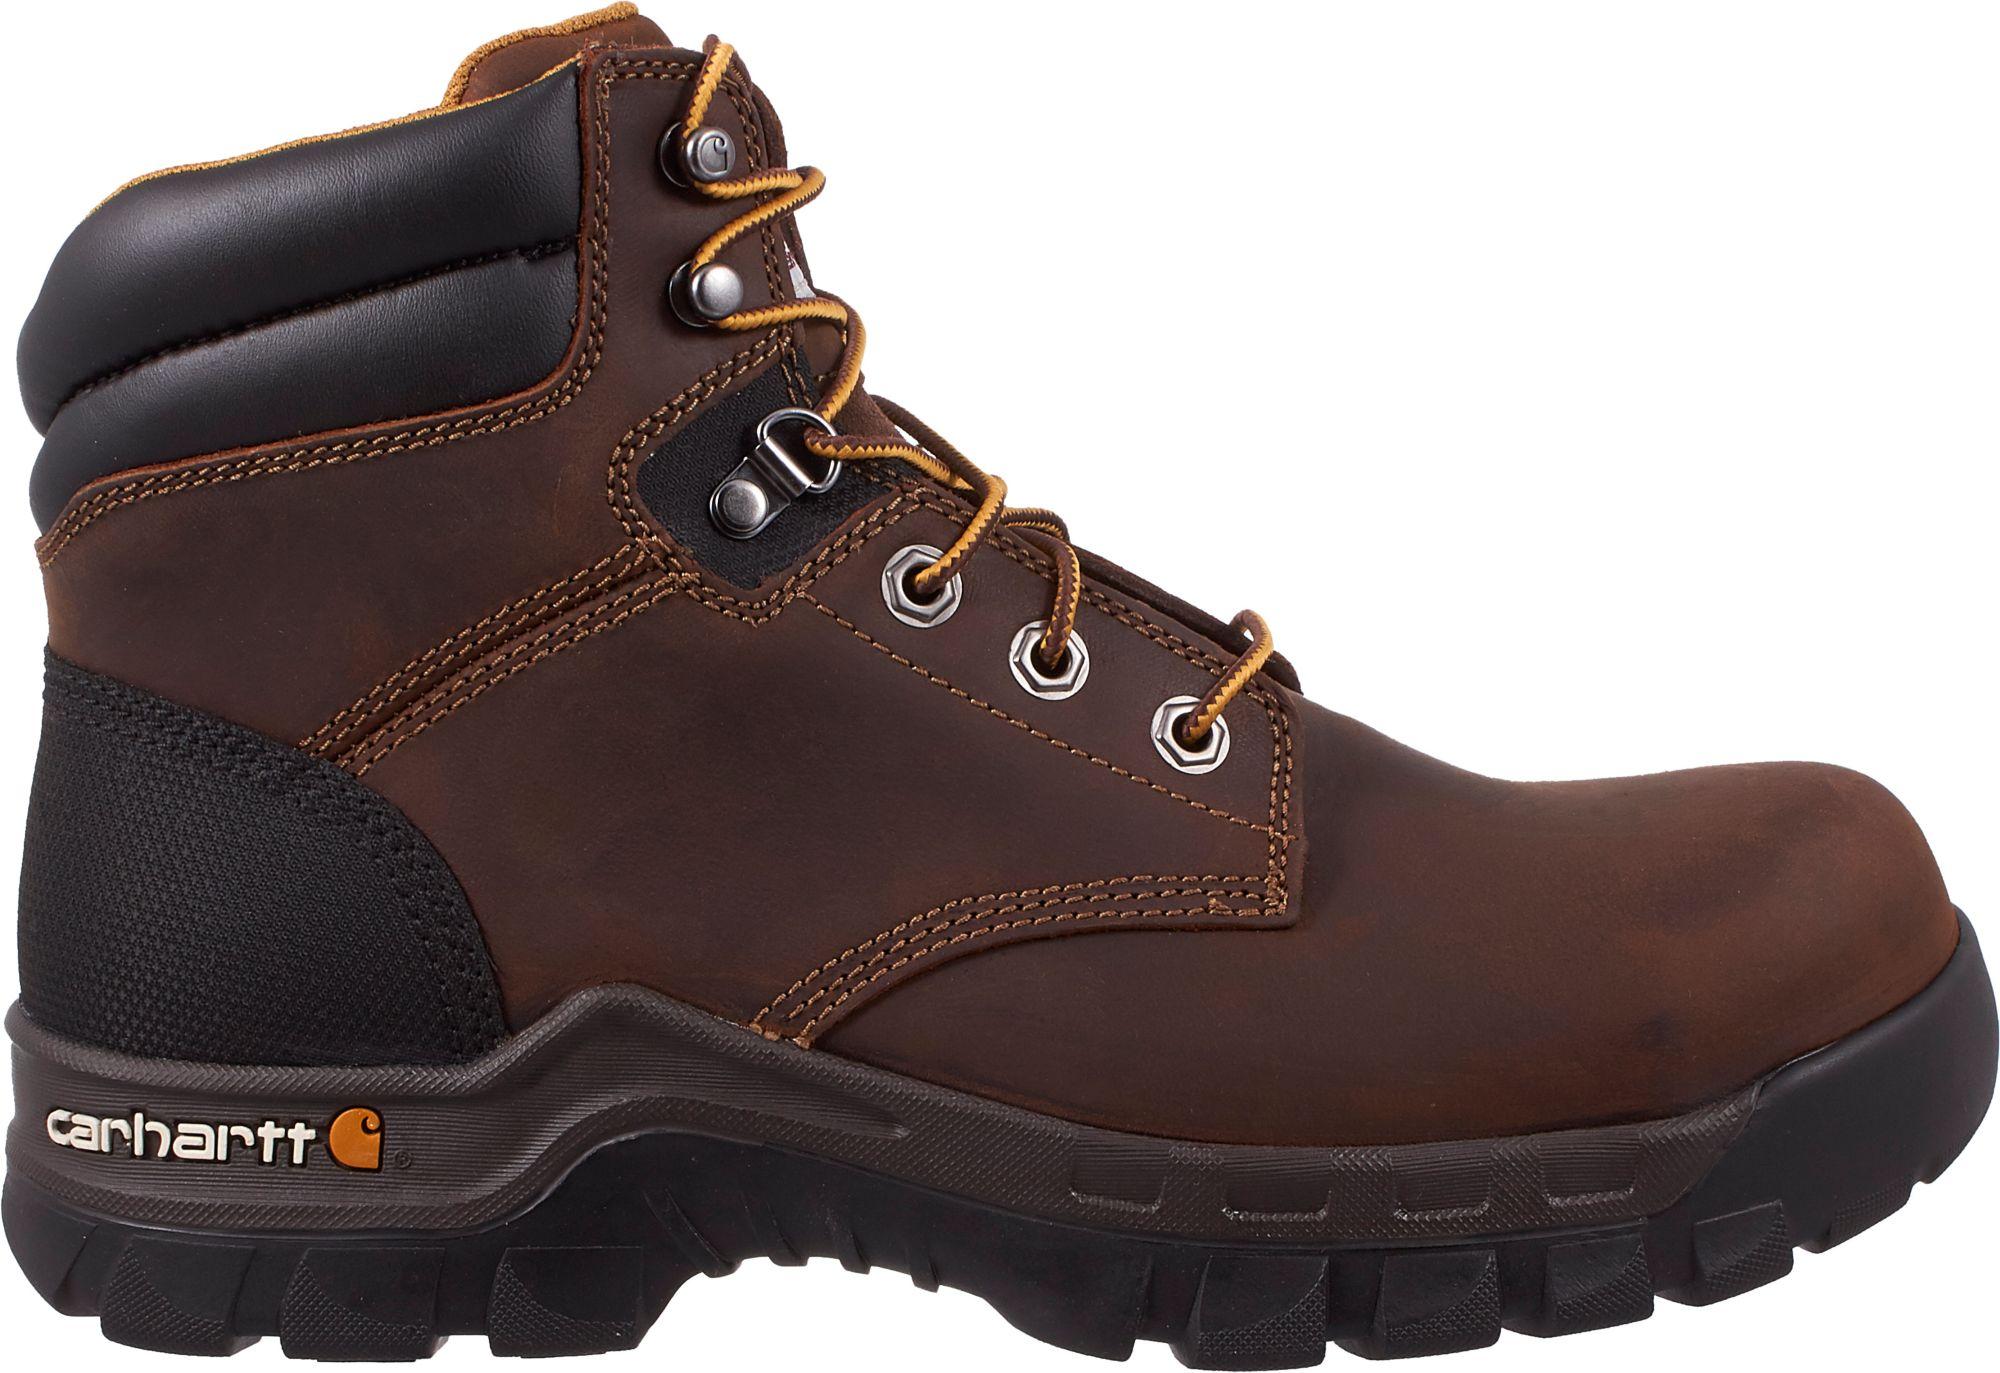 Carhartt Men's Rugged Flex 6'' Composite Toe Work Boots. 0:00. 0:00 / 0:00.  noImageFound ???